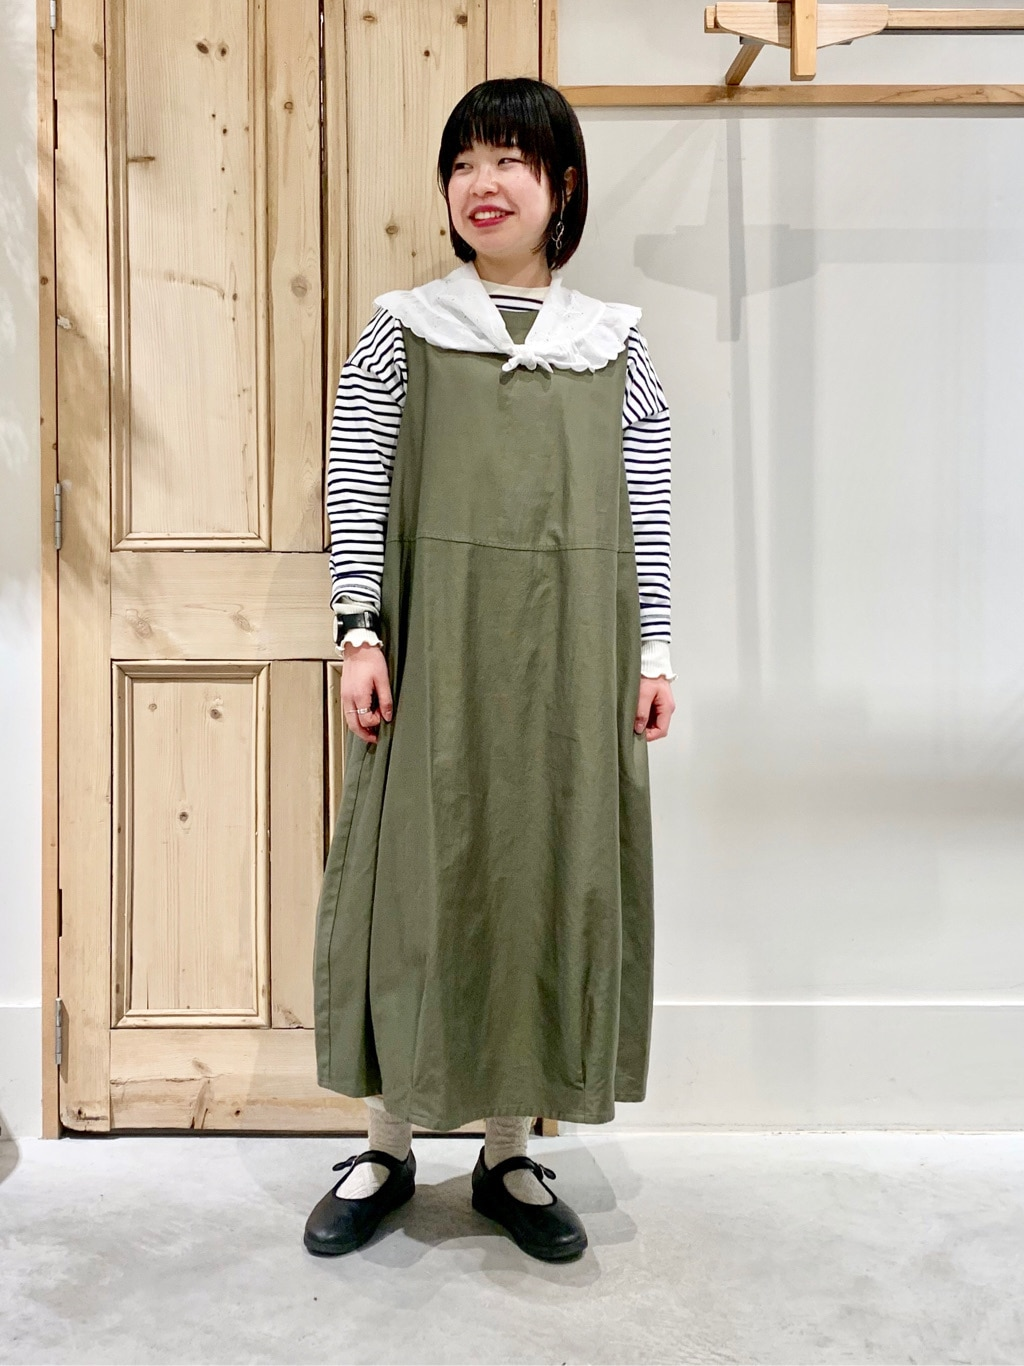 Malle chambre de charme 調布パルコ 身長:153cm 2021.02.03